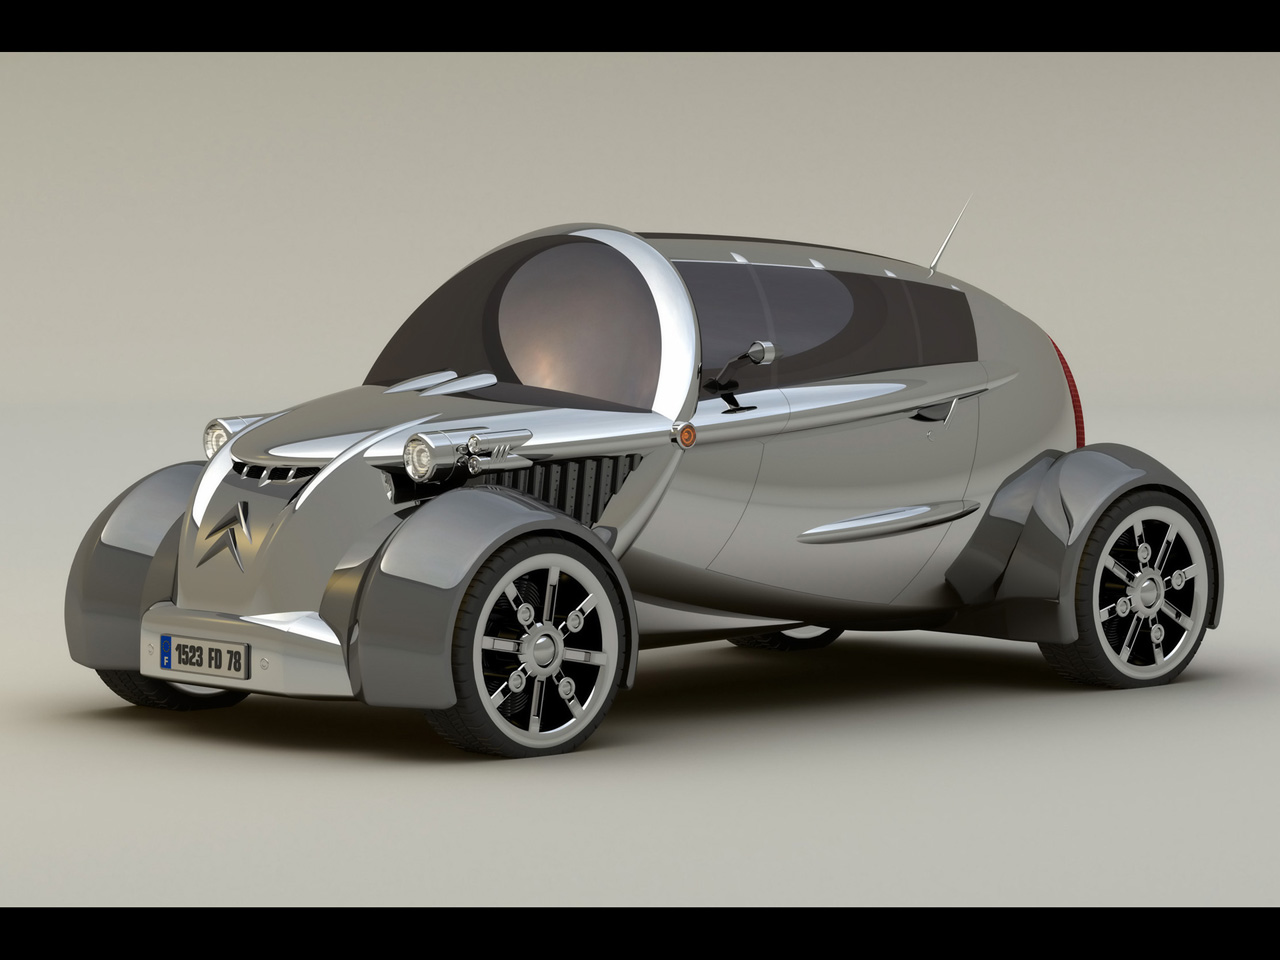 2008 Citroen 2CV Concept Design by David Portela Side Angle Wallpaper Backgrounds